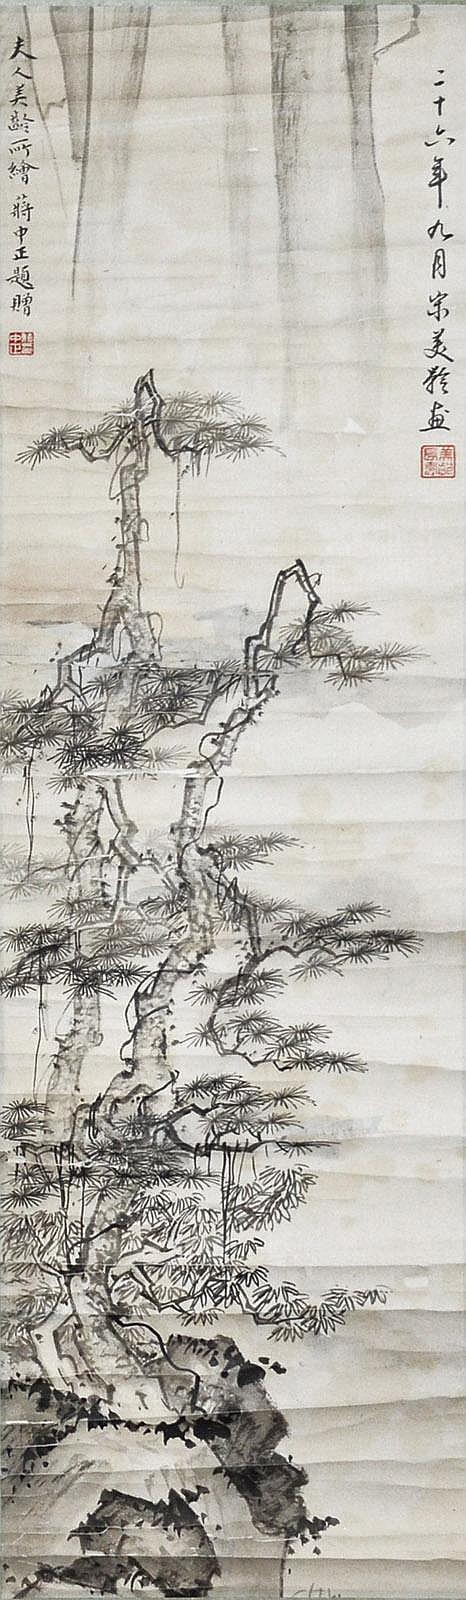 宋美齡 (1897 - 2003) 雙松圖 (寓意二人長壽) Song Meiling Two Pine Trees